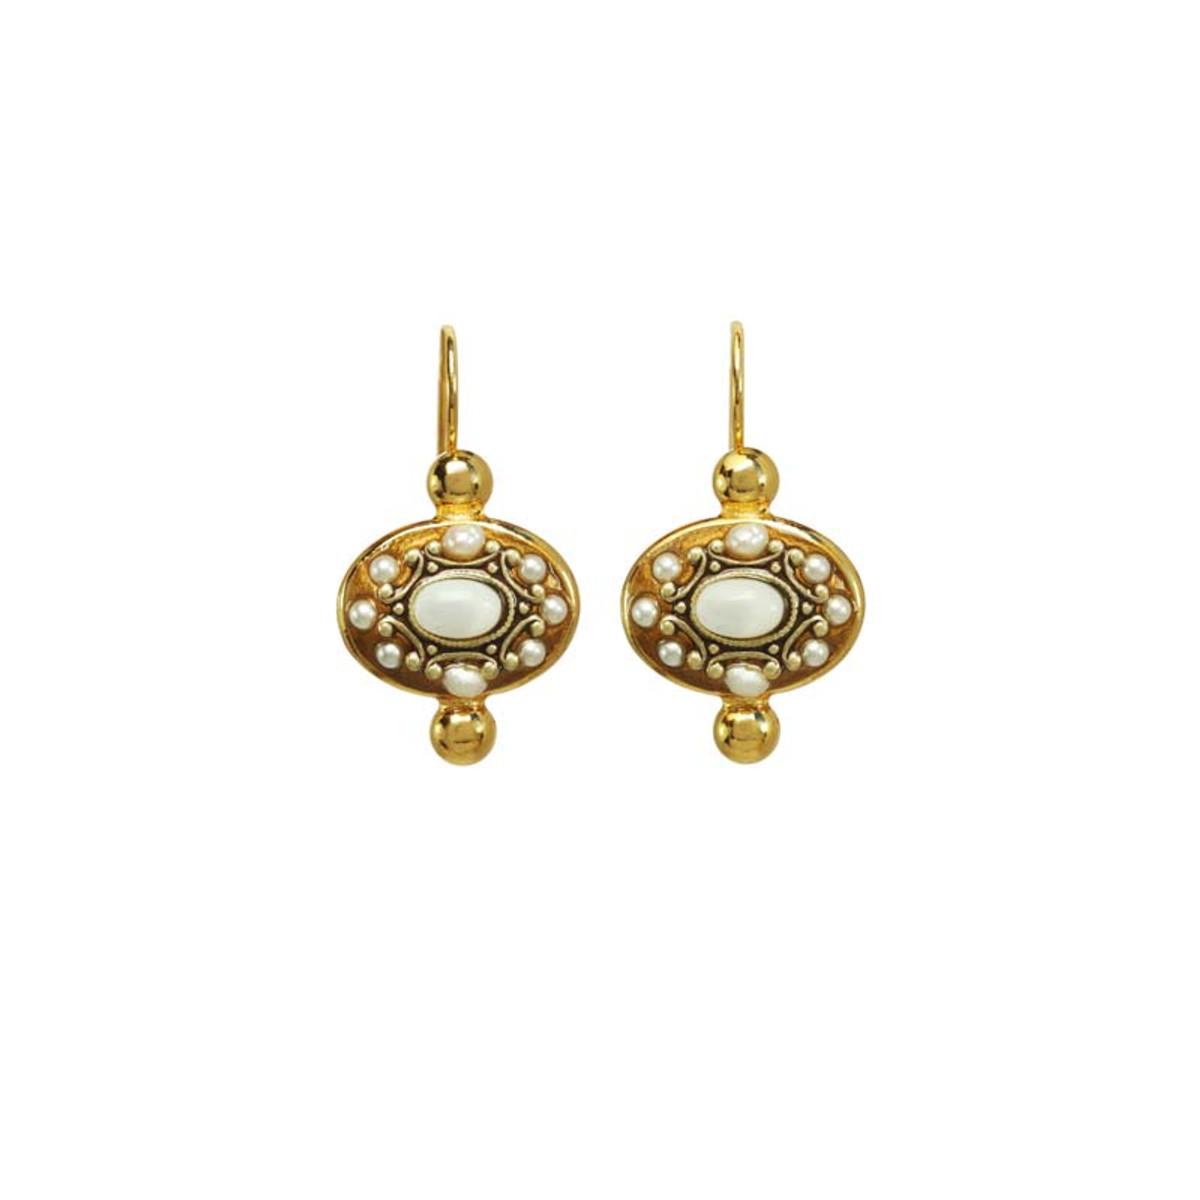 Michal Golan Jewelry Elegante White Earrings